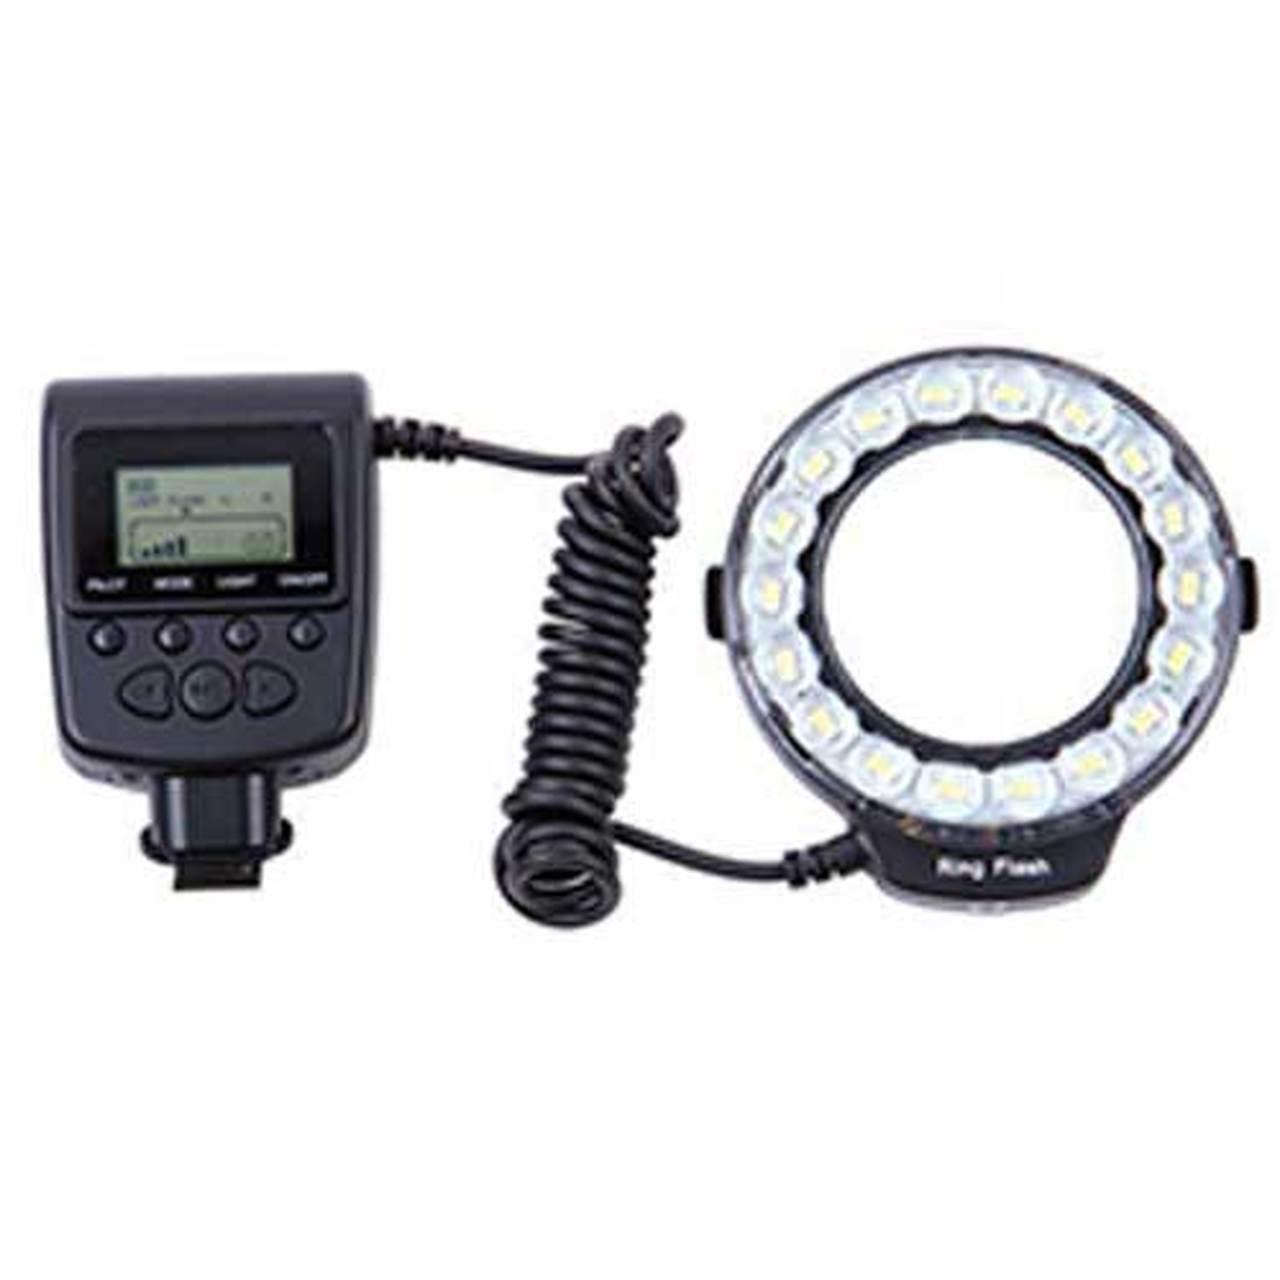 Promaster 1888 RL-100 Macro LED Ring  Flash